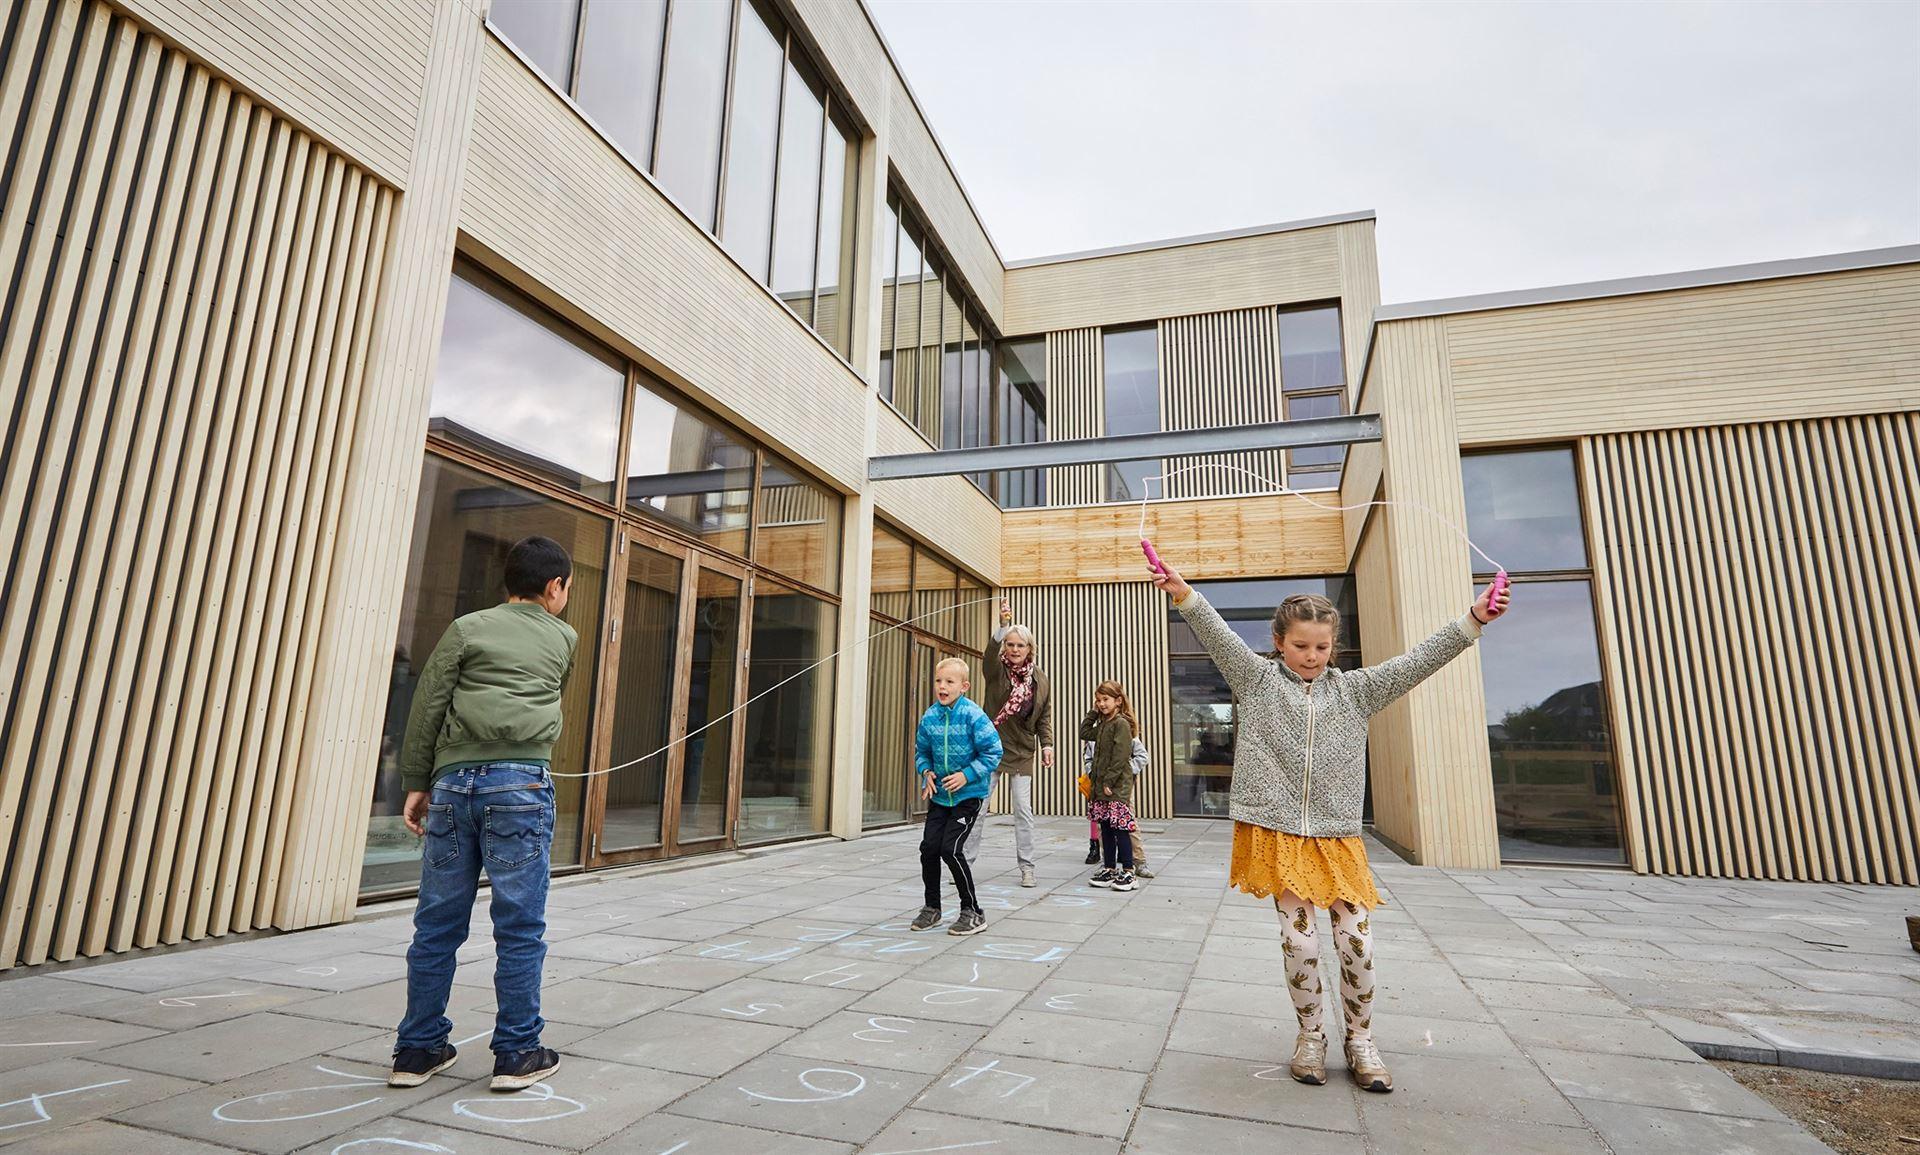 Erlev Skole Foto: Haderslev Kommunes facebookside